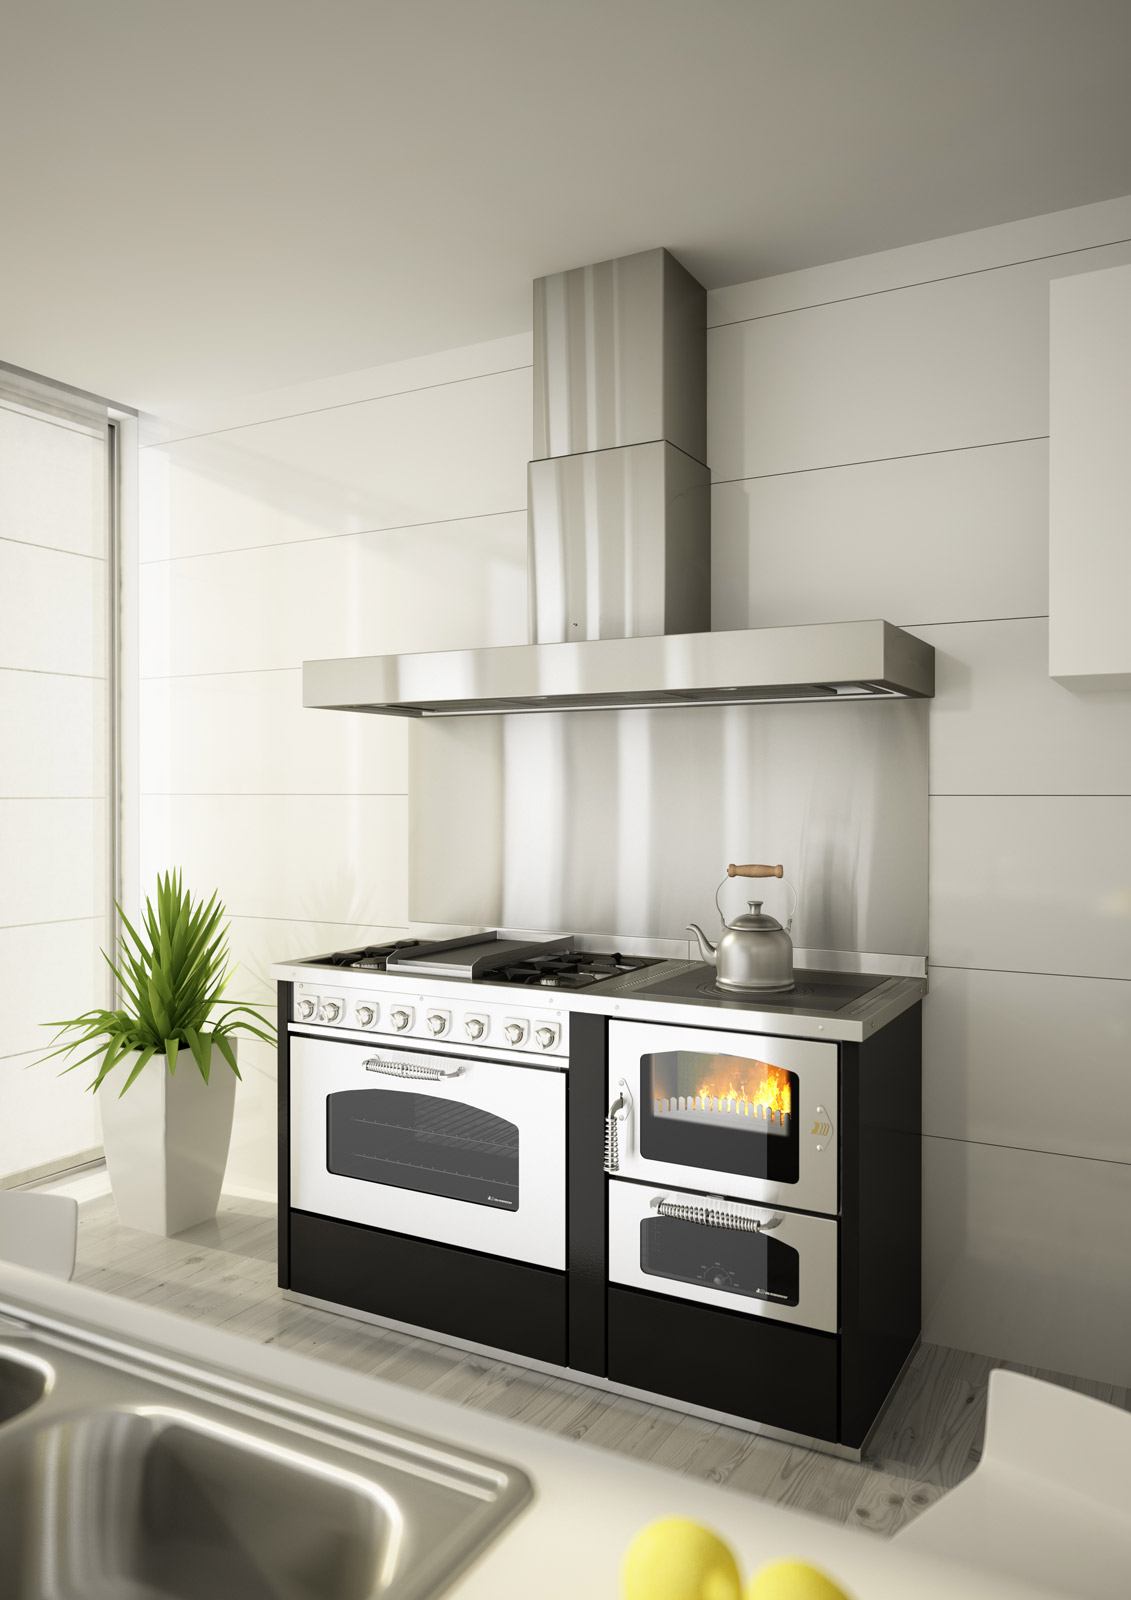 D6 demanincor s p a - Presa d aria cucina ...